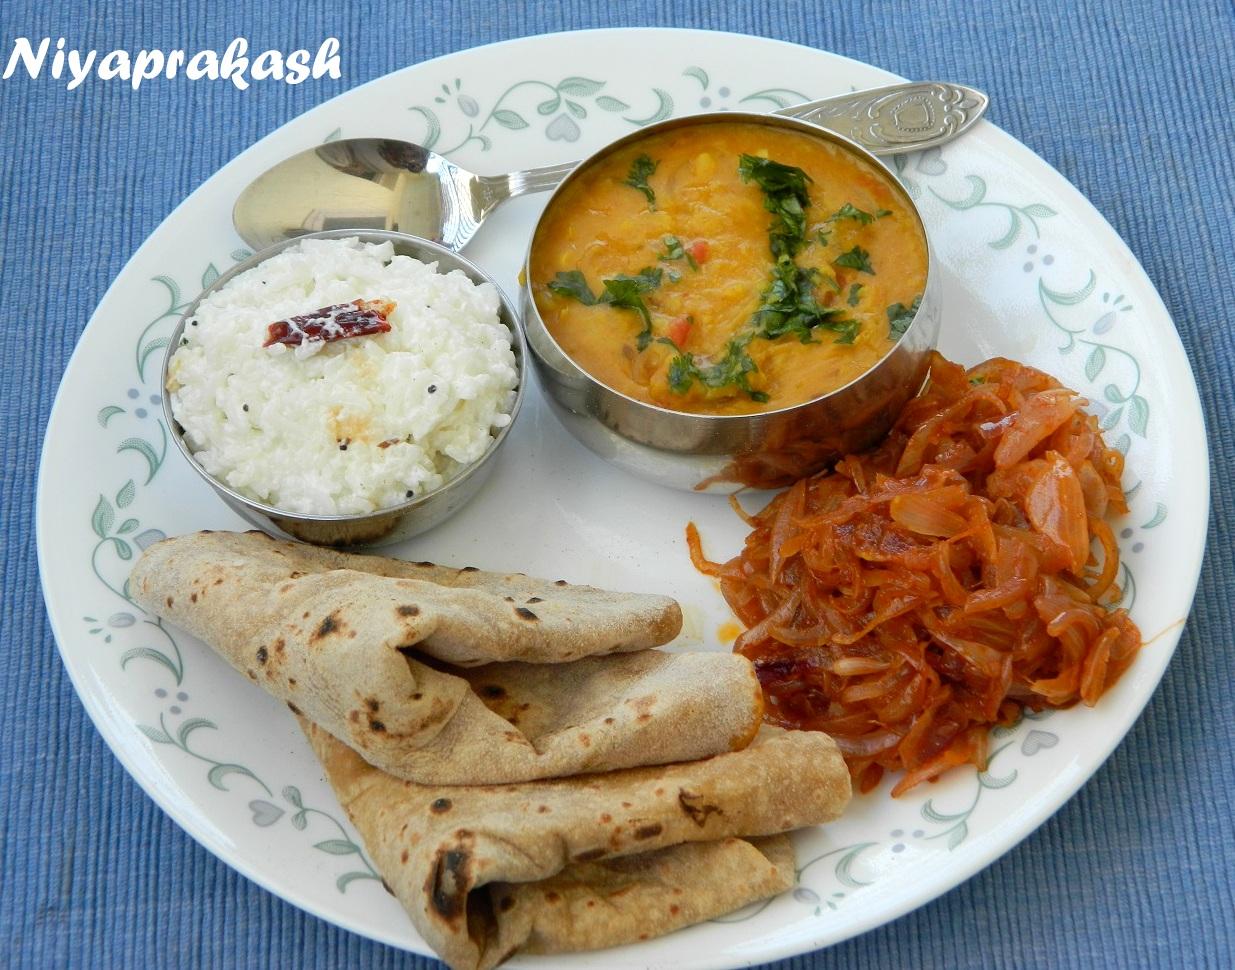 Vegetarian recipes main dish entrees vegetarian food search results